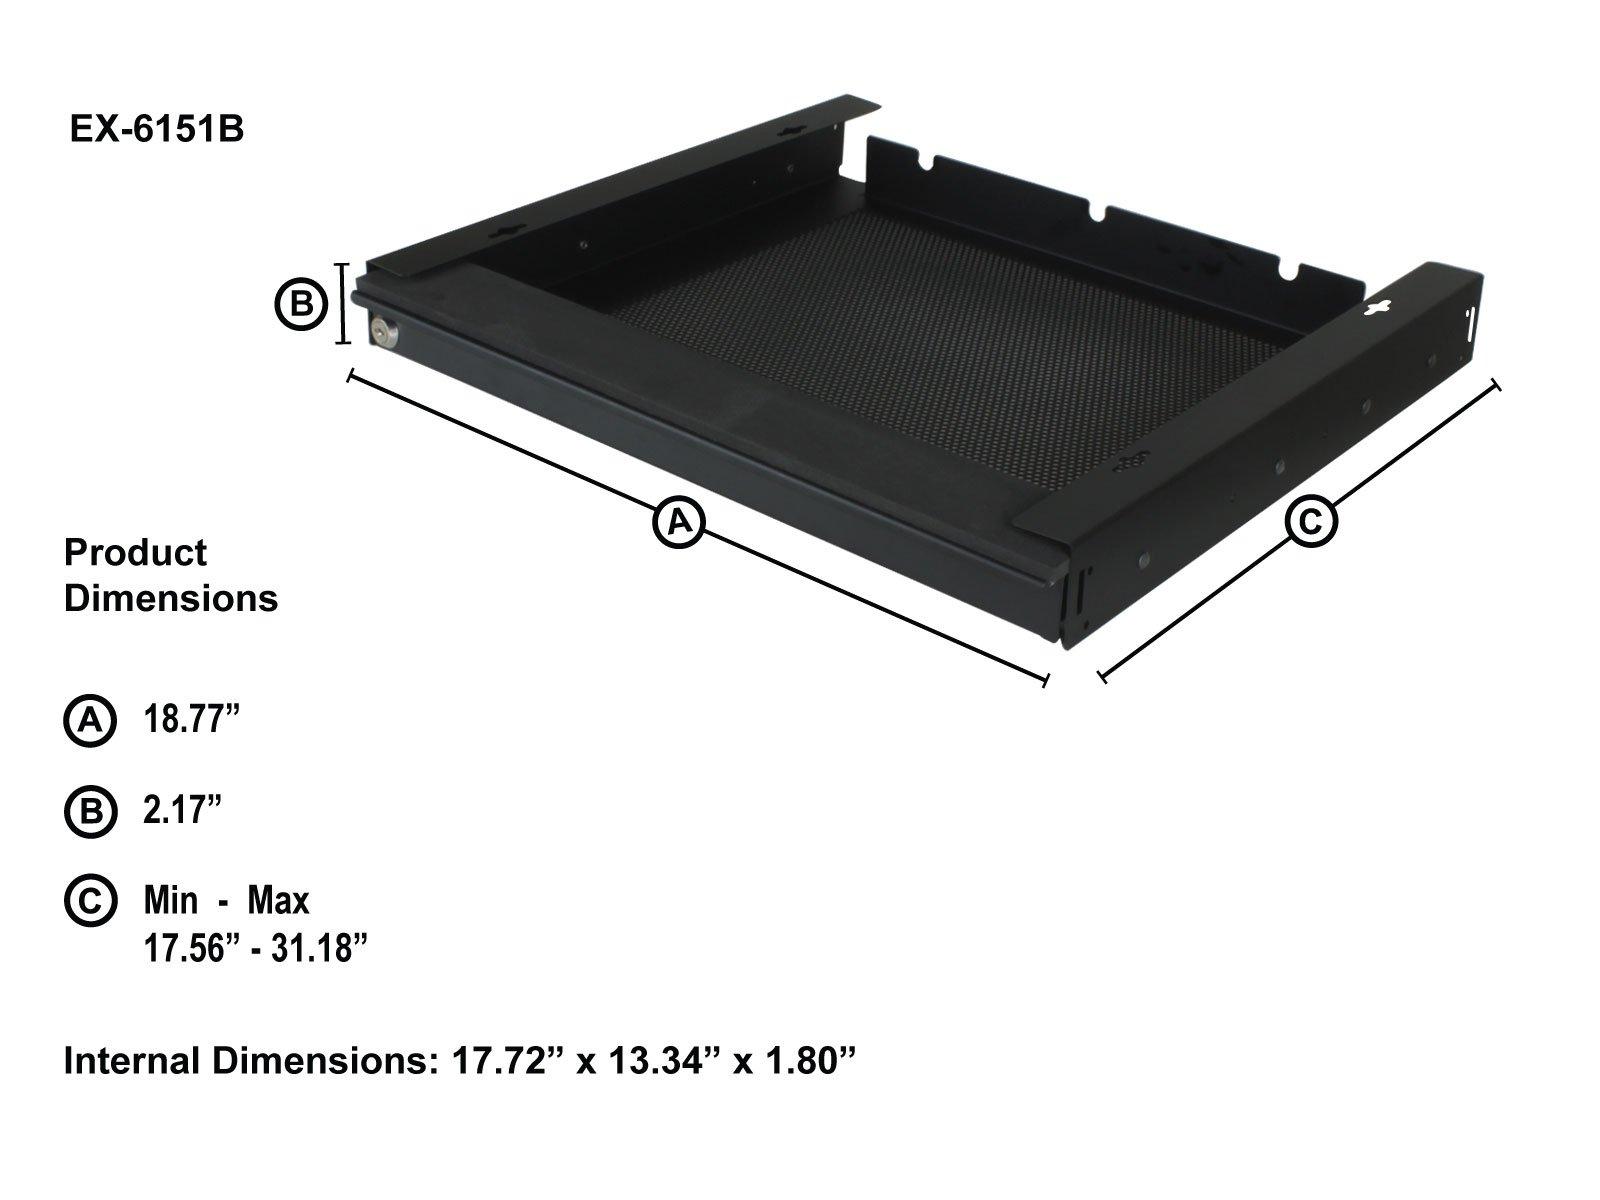 Penn Elcom EX-6151B 17'' Extendable Locking Laptop Security Drawer, Low Depth